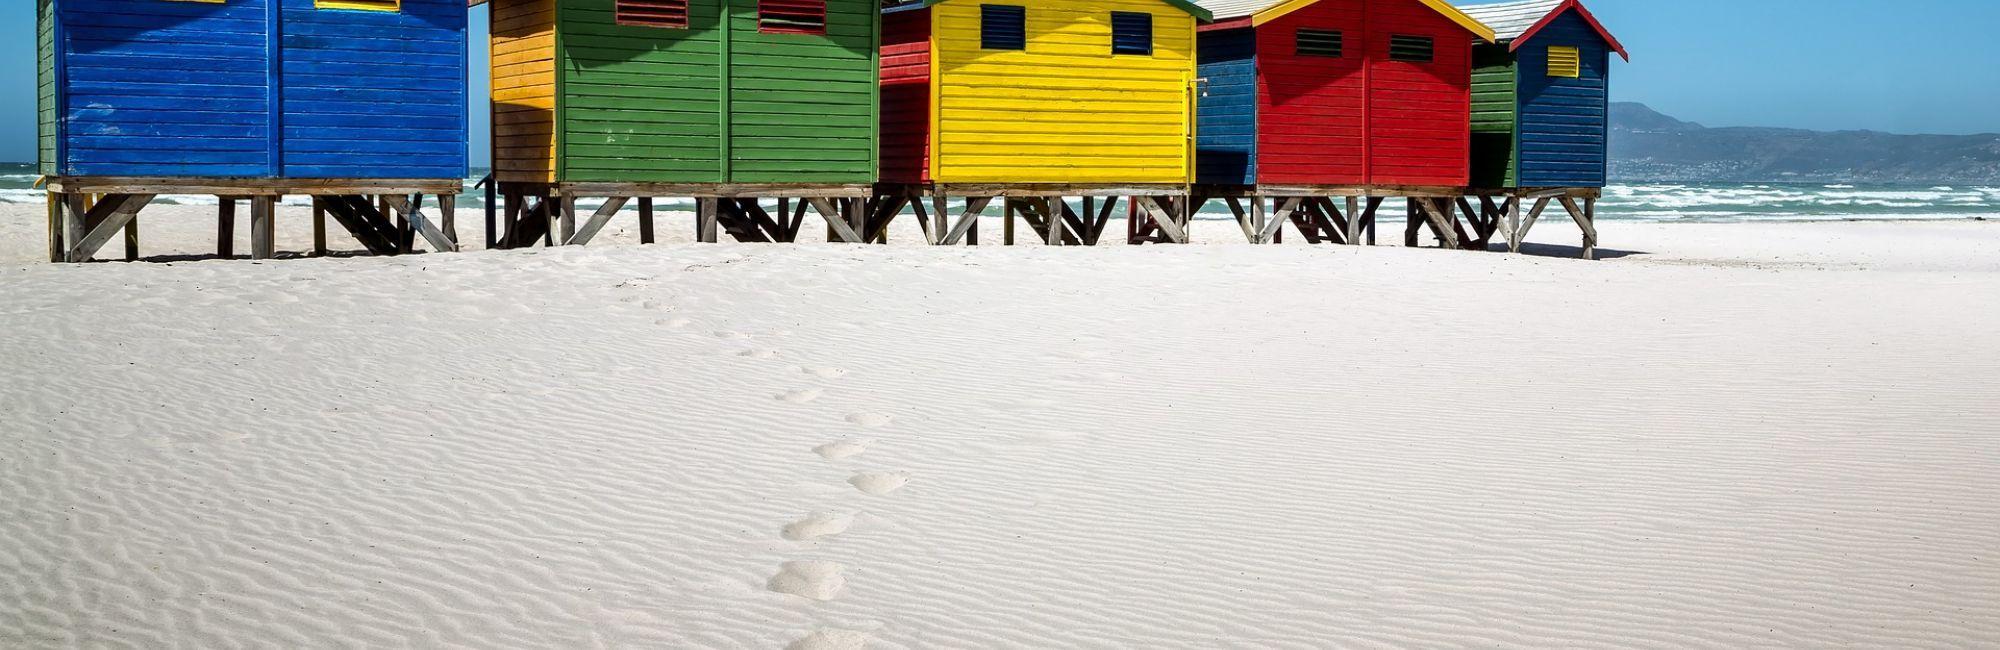 Zuid-Afrika Muizenberg strand